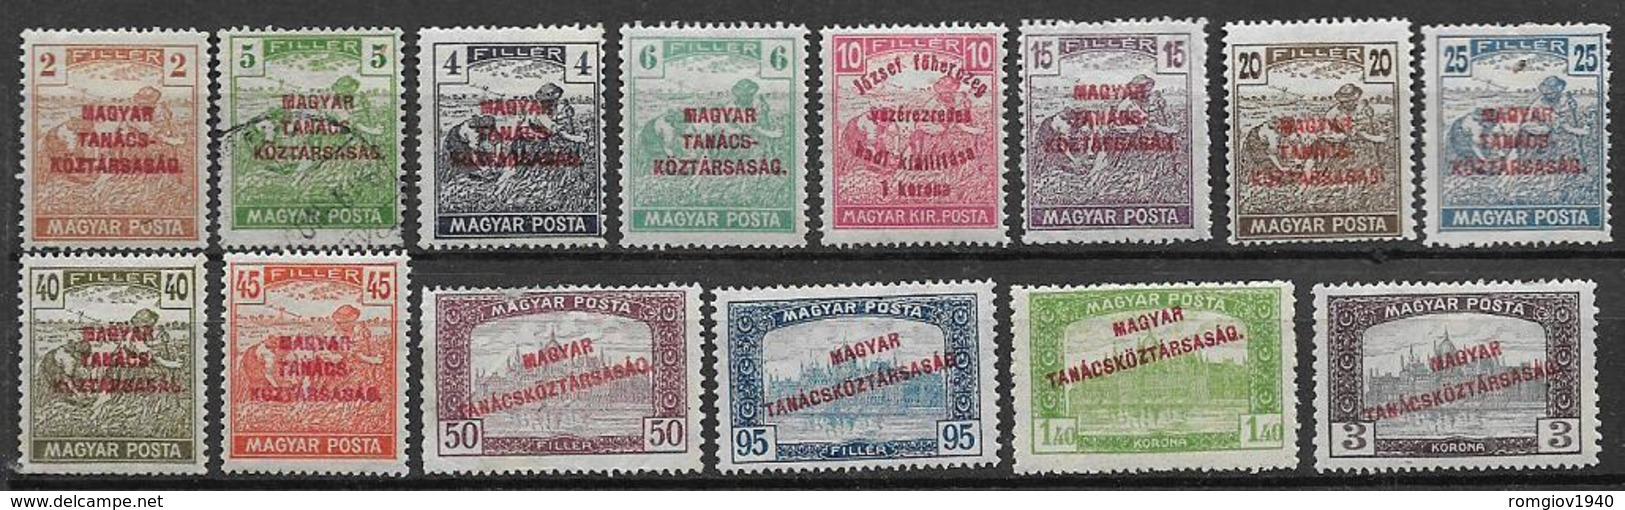 UNGHERIA  1919 SOPRASTAMPATI YVERT. 245-63 MISTA  VF NON COMPLETA - Usati